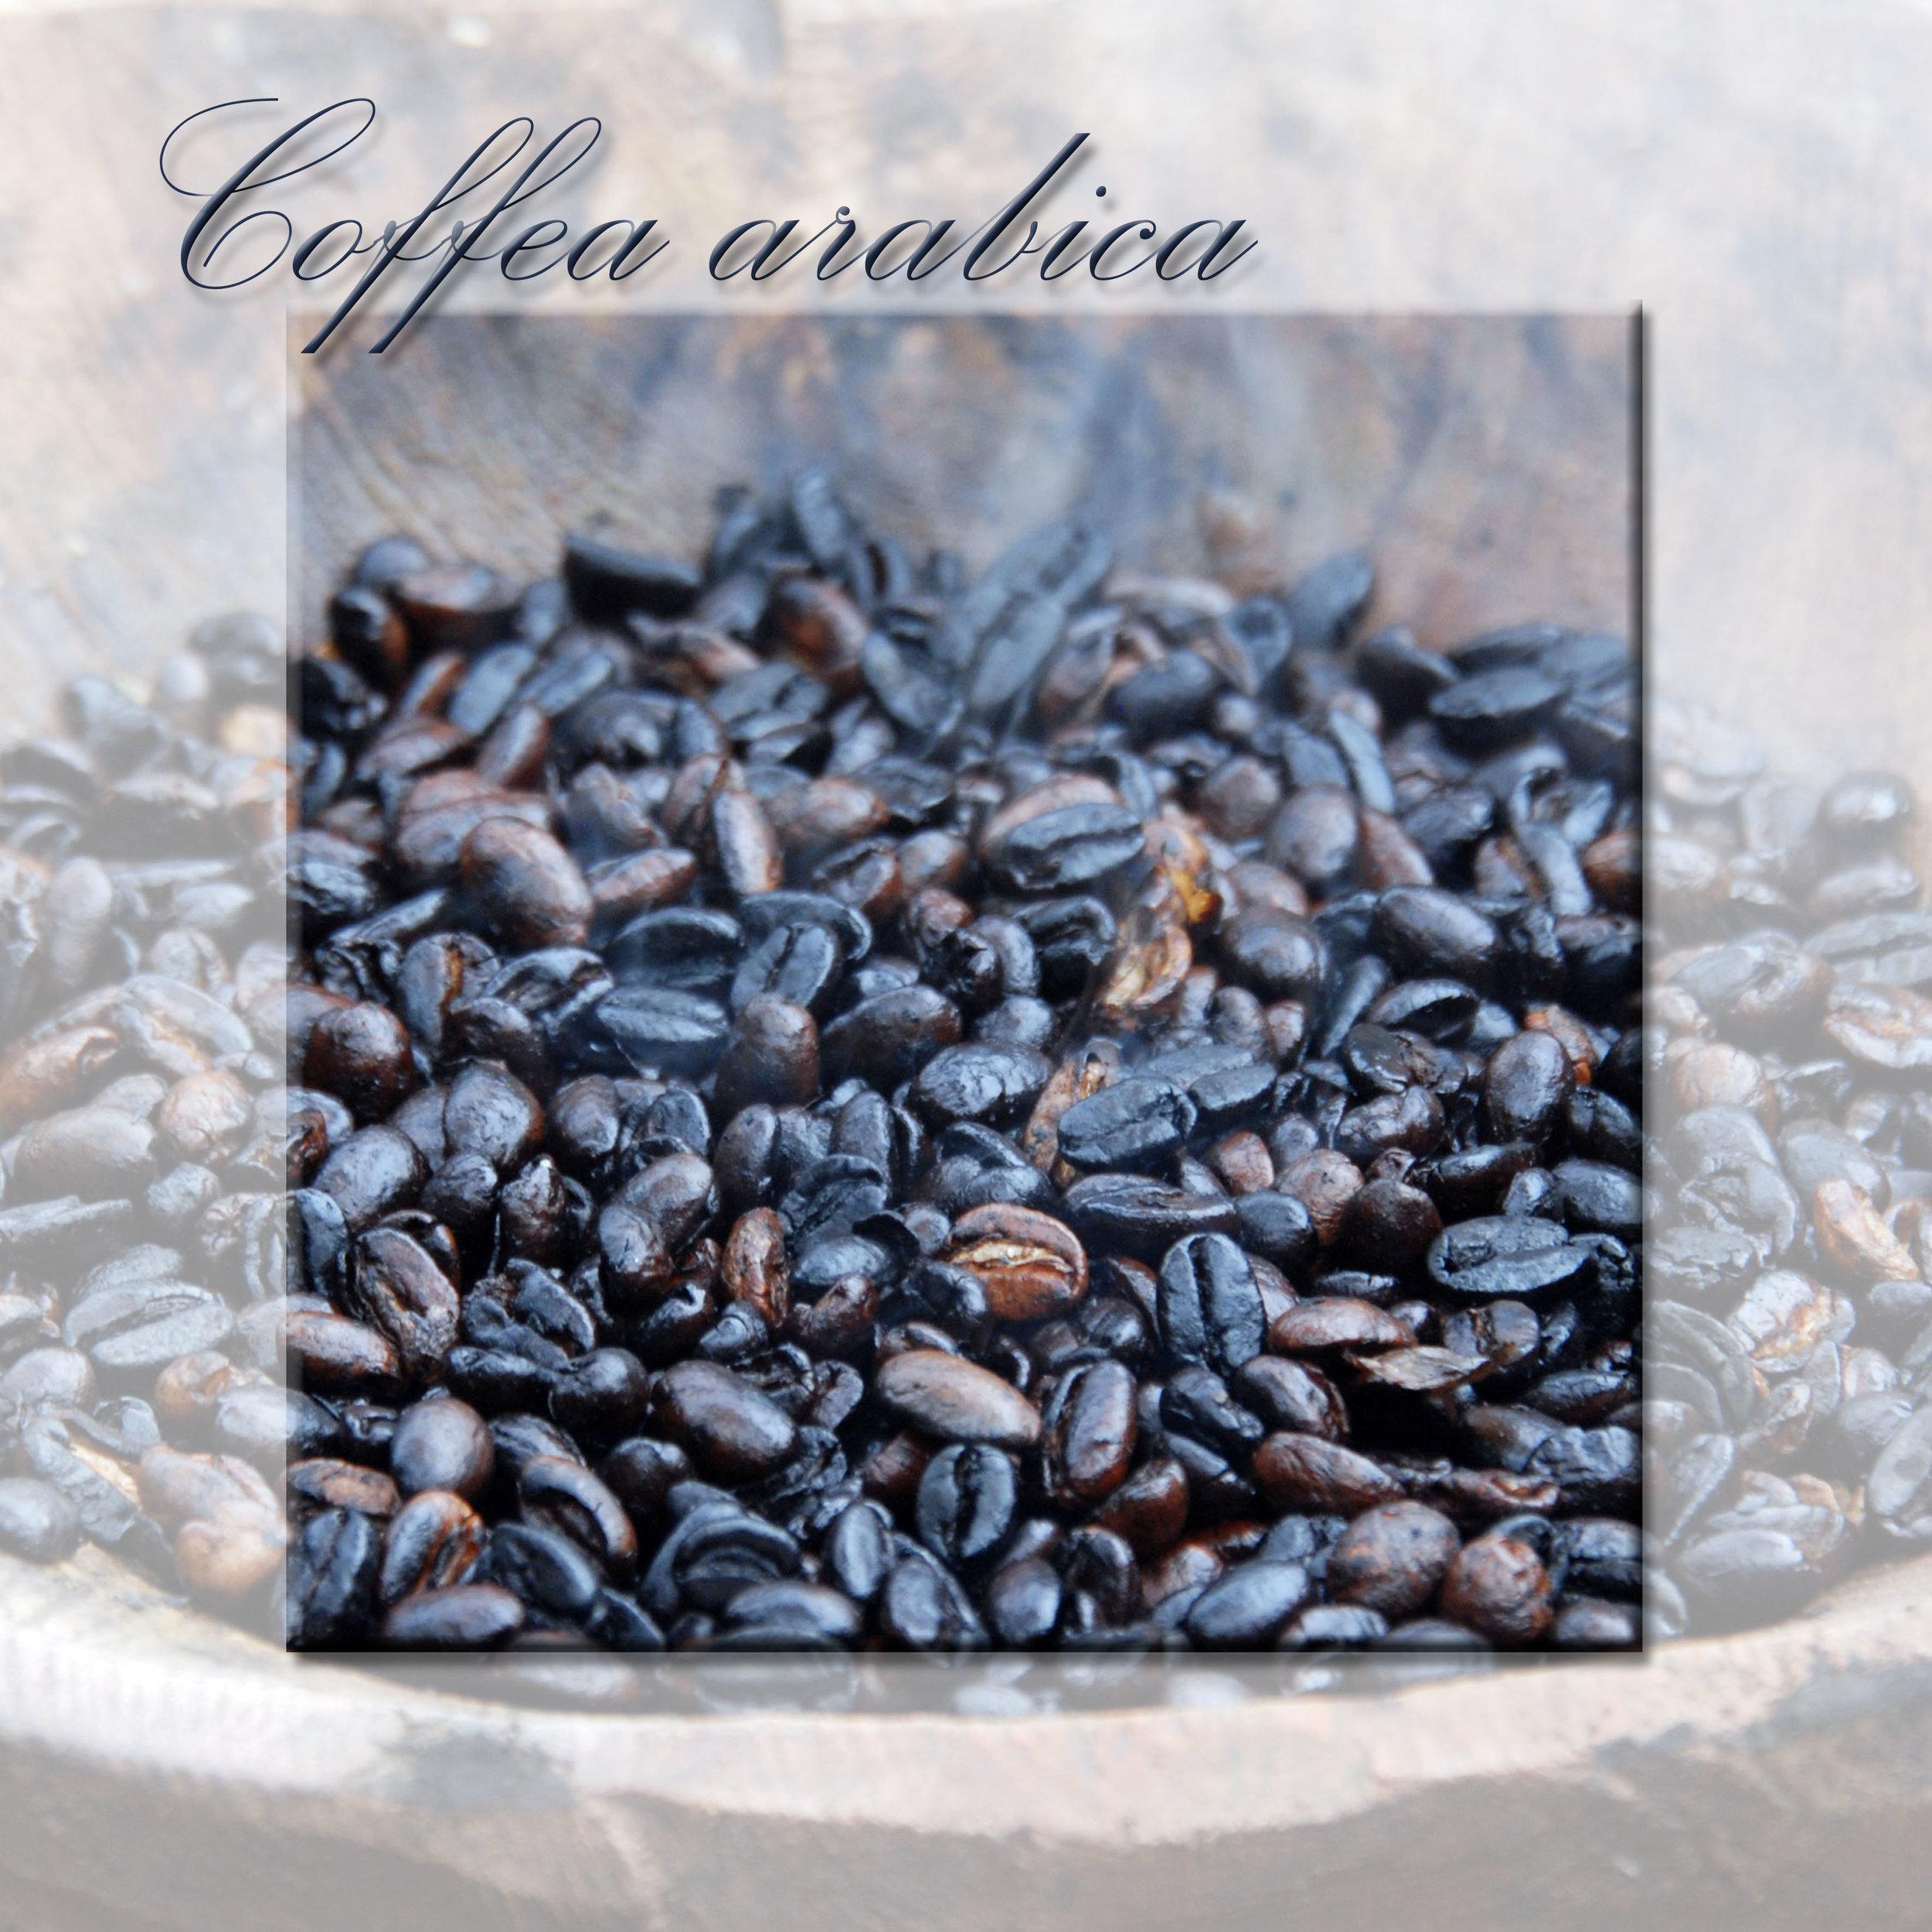 Coffea arabic.jpg